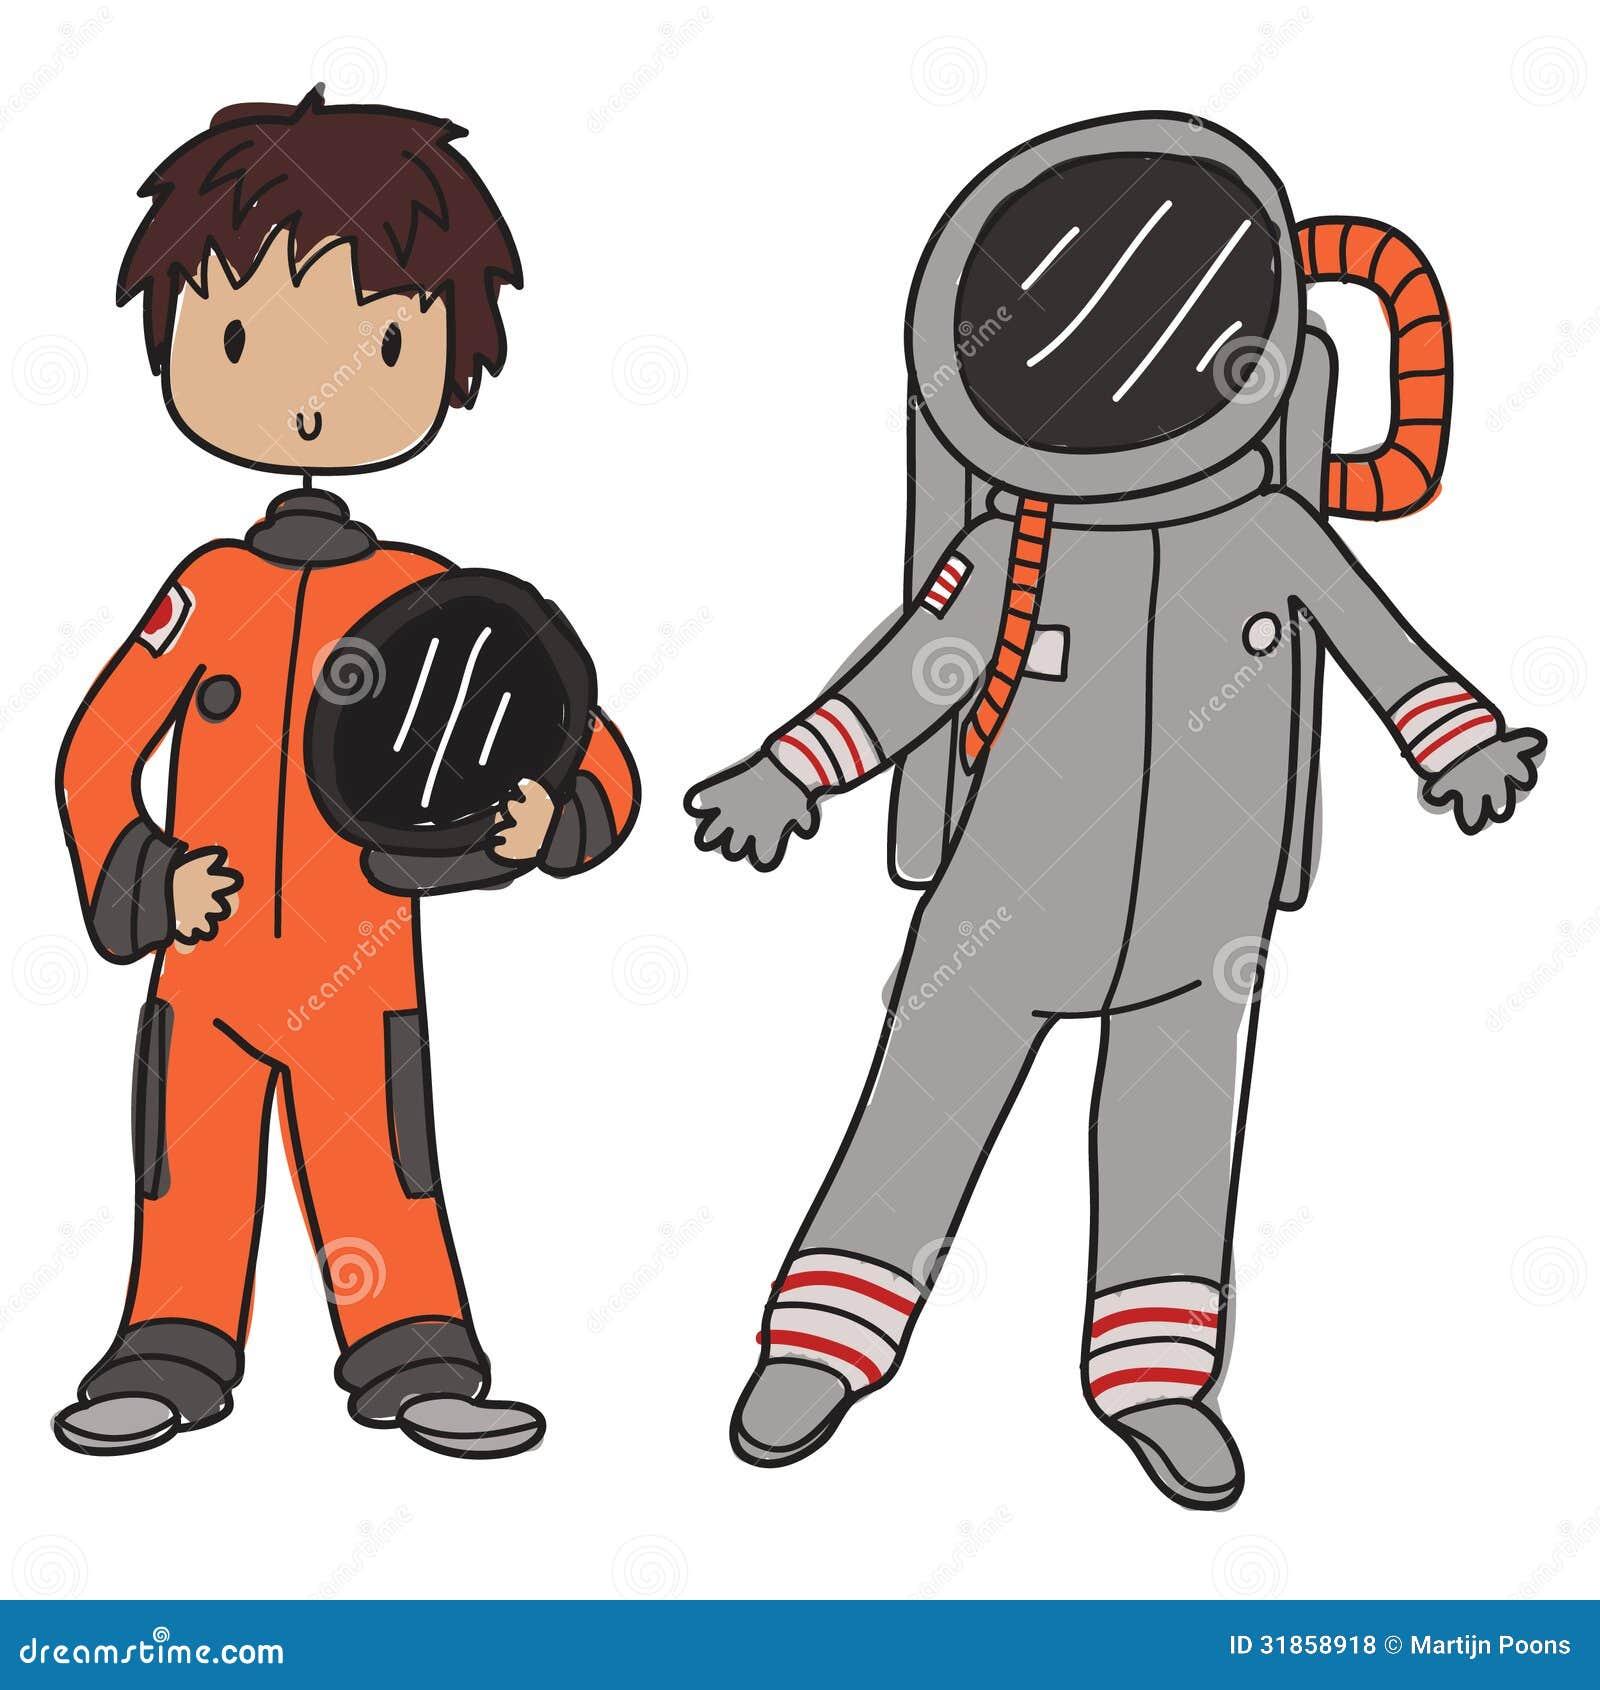 Astronaut Royalty Free Stock Photos - Image: 31858918